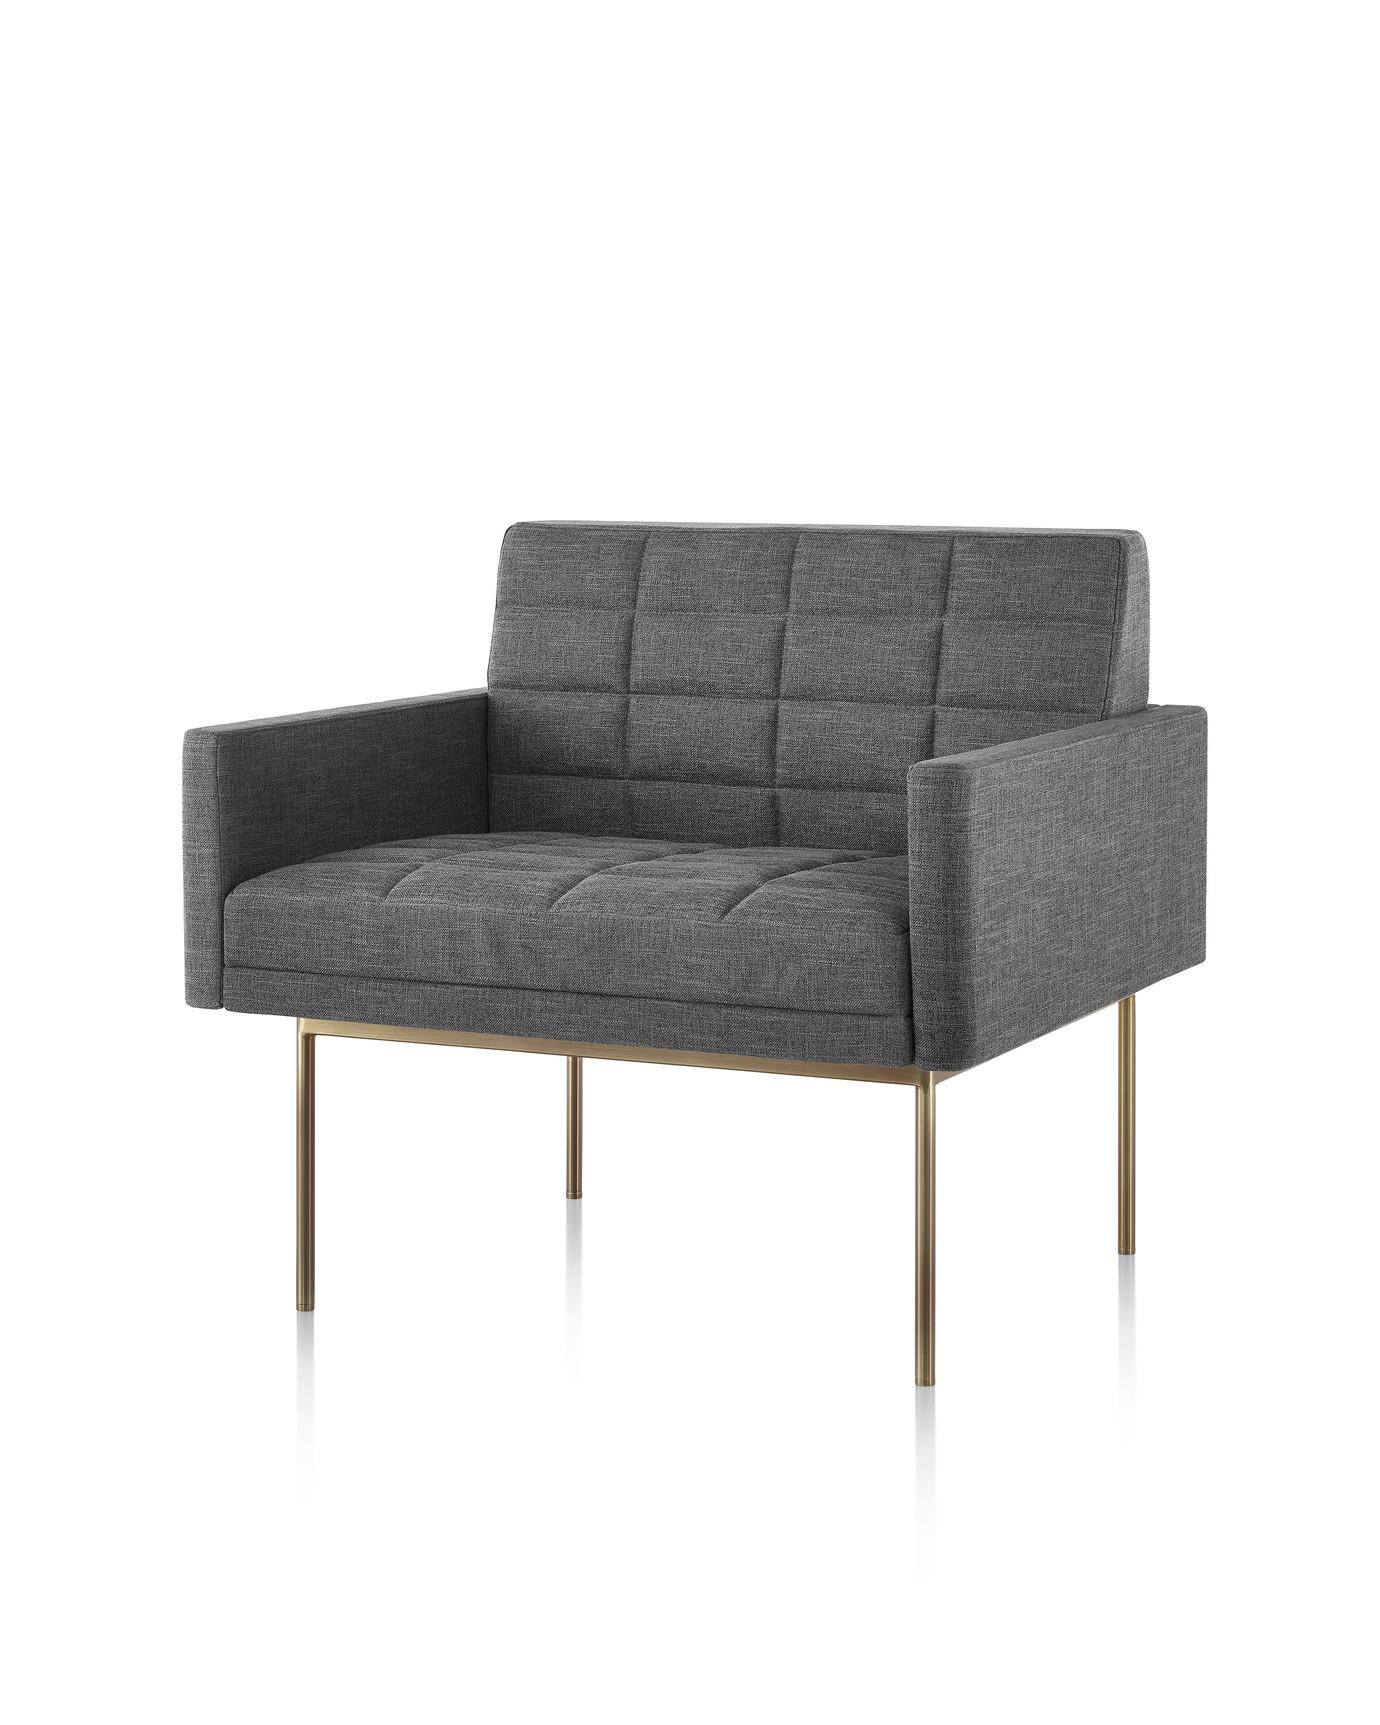 4-Silla-Lounge-Tuxedo-Beauty-1380